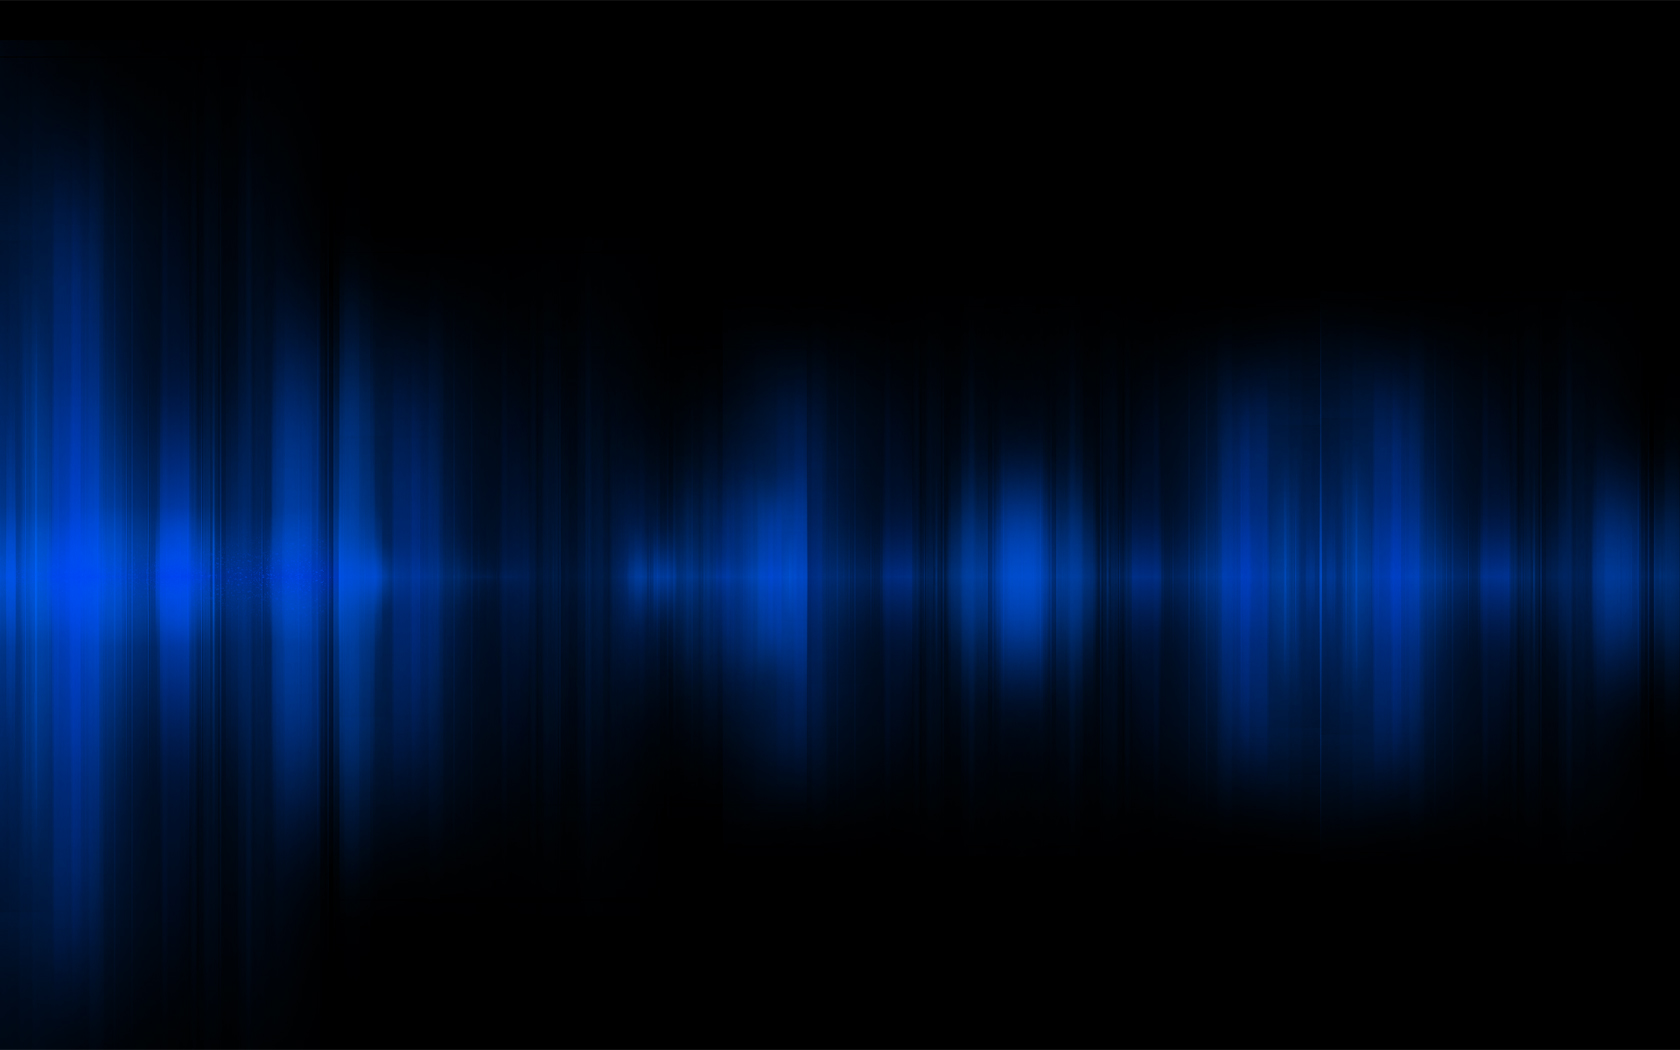 Blue Digital Art Black Background Wallpaper Full HD Wallpapers 1680x1050